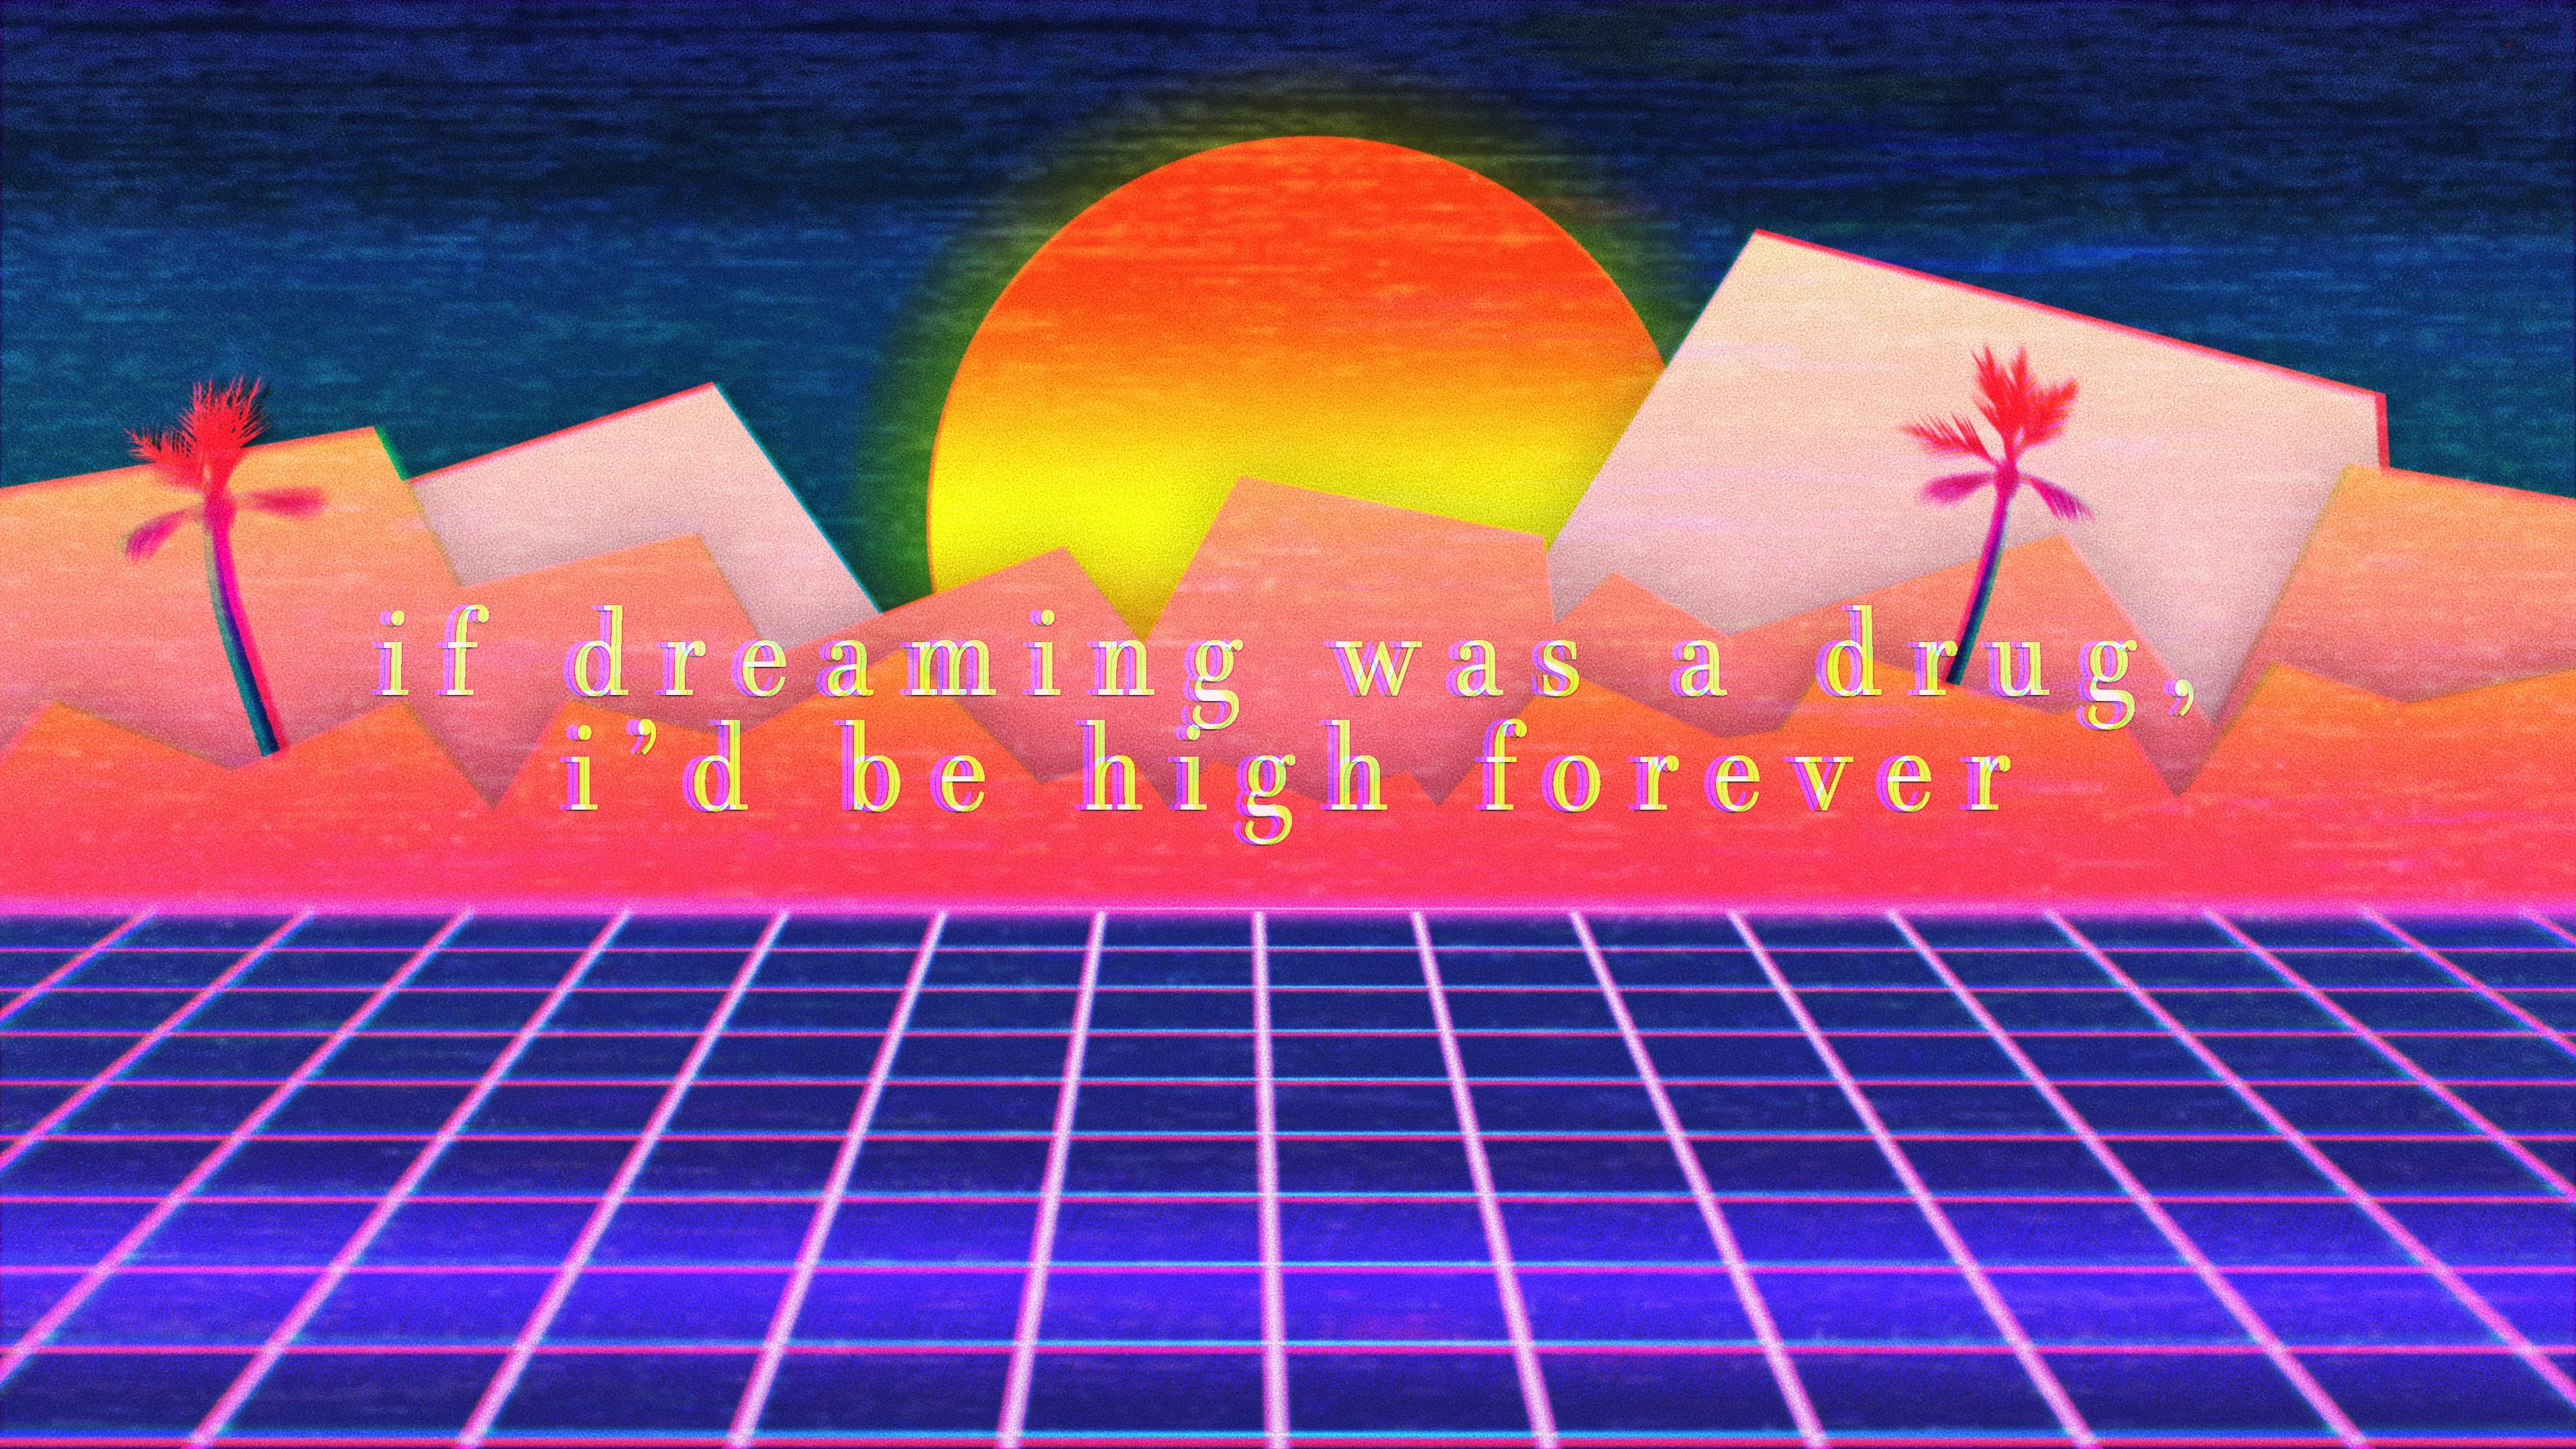 Wallpaper Outrun Sunset Vaporwave 3840x2160 Pokertour